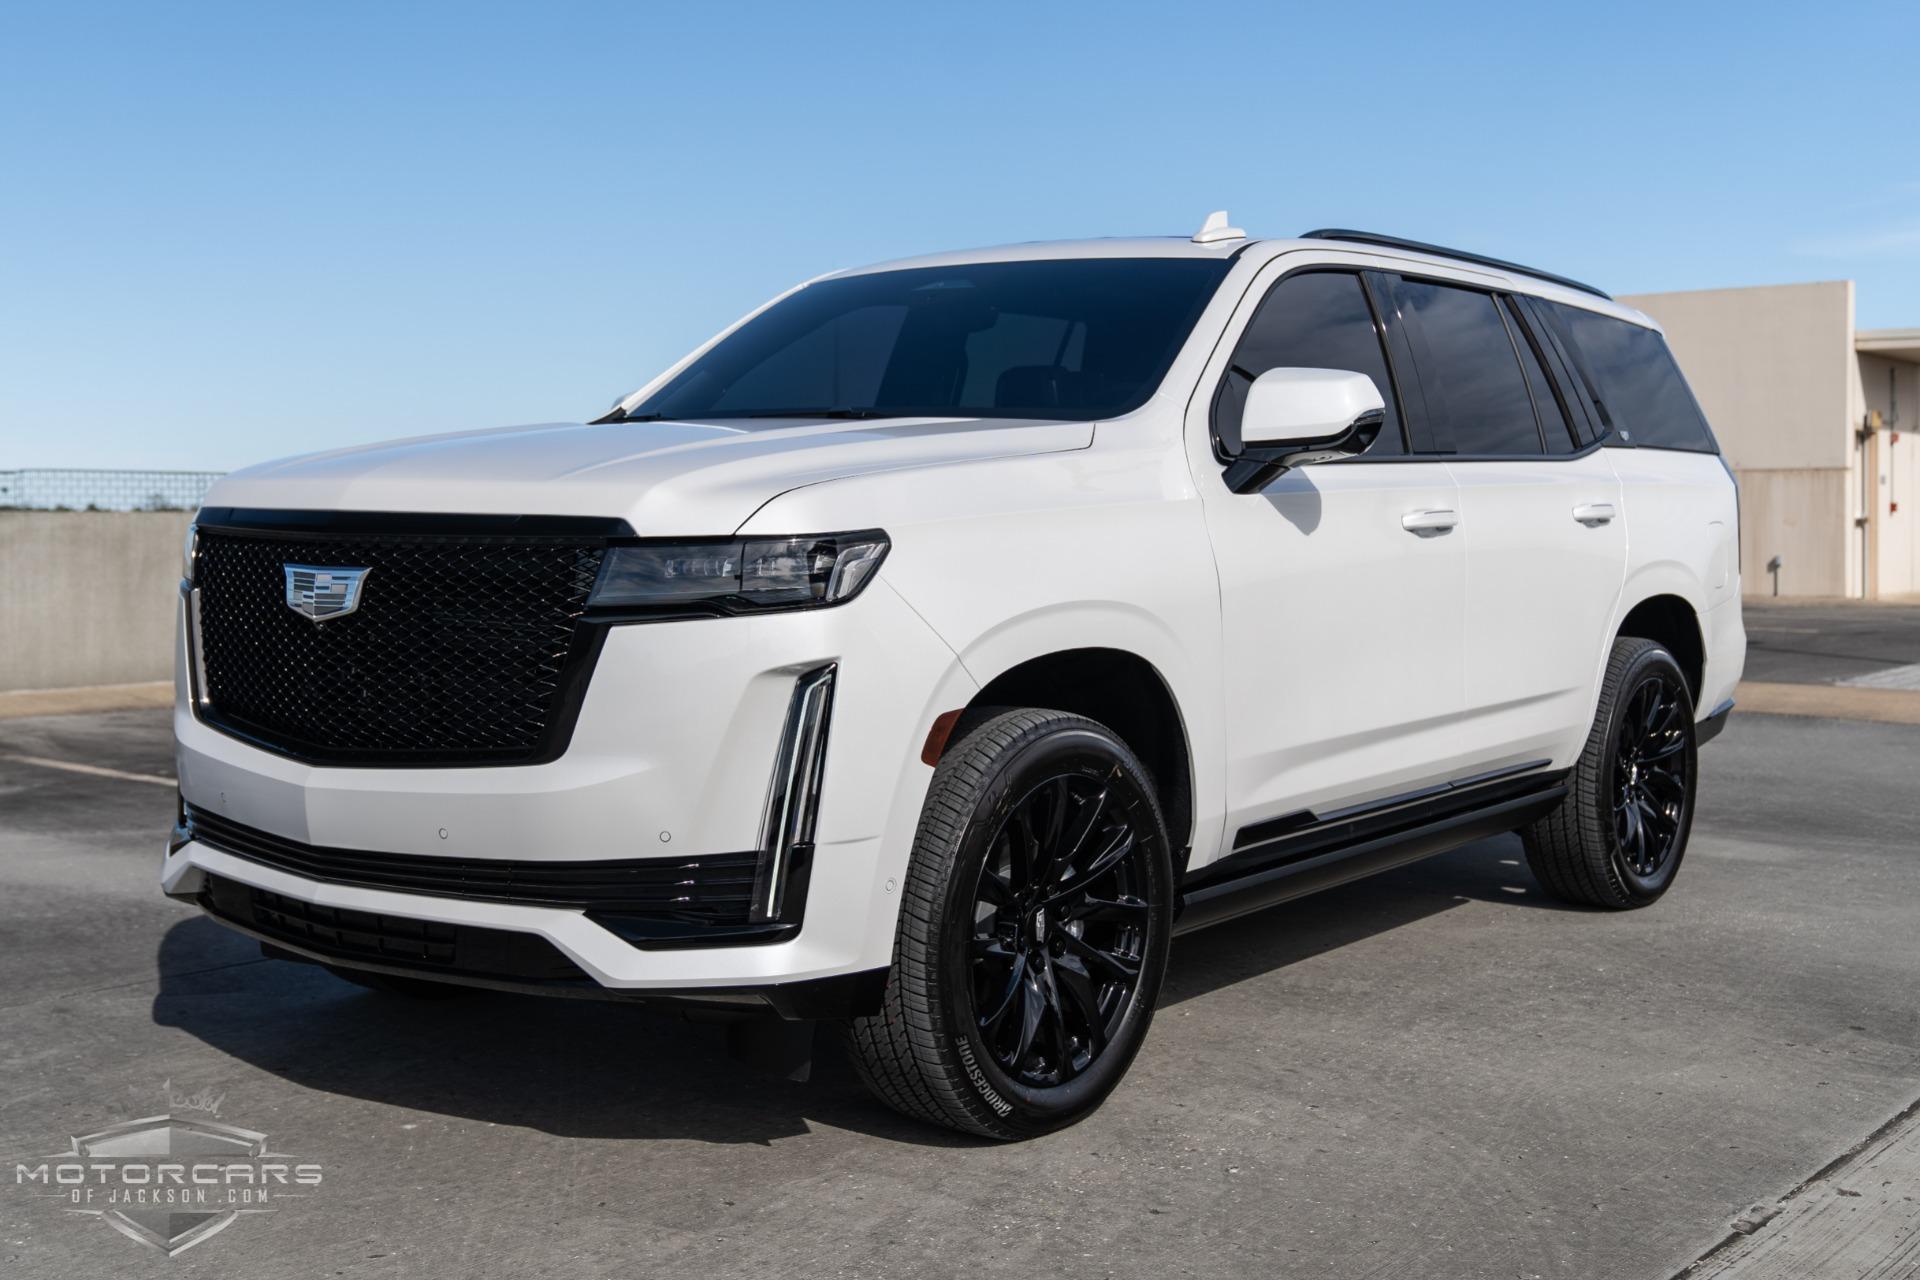 Used-2021-Cadillac-Escalade-Sport-Platinum-4WD-Jackson-MS